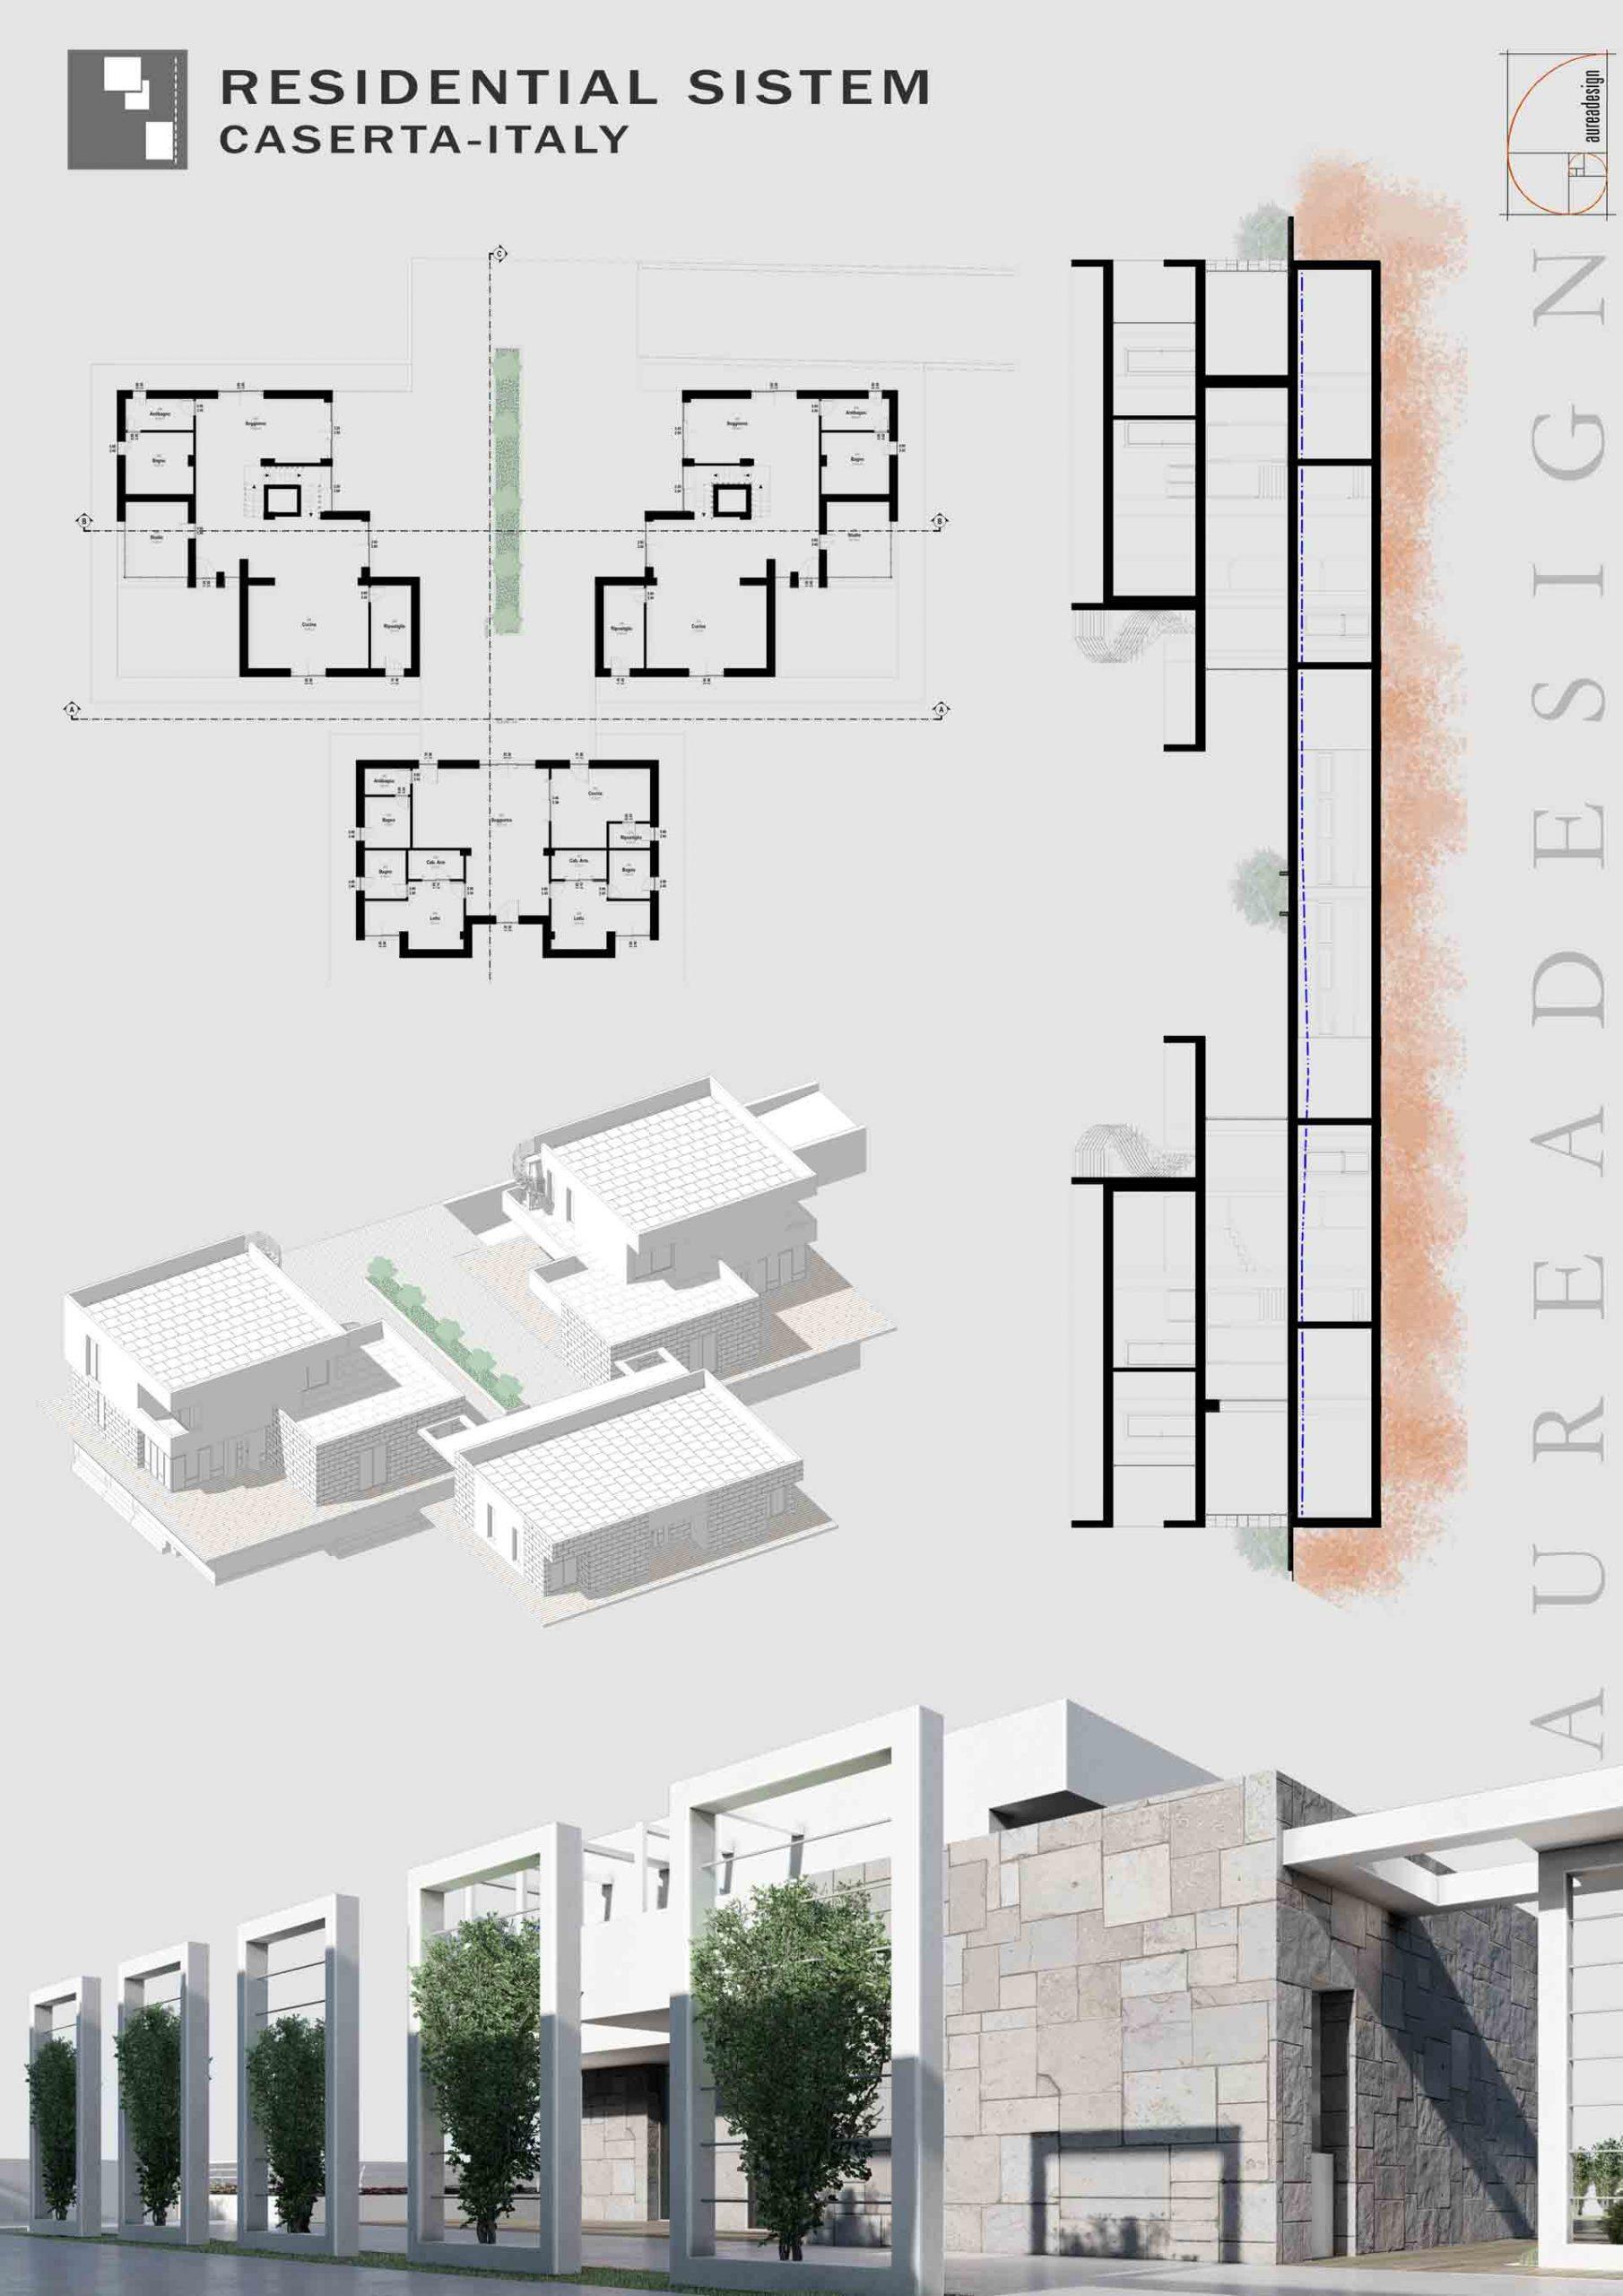 auredesign.com_progettti_residential_villas_00